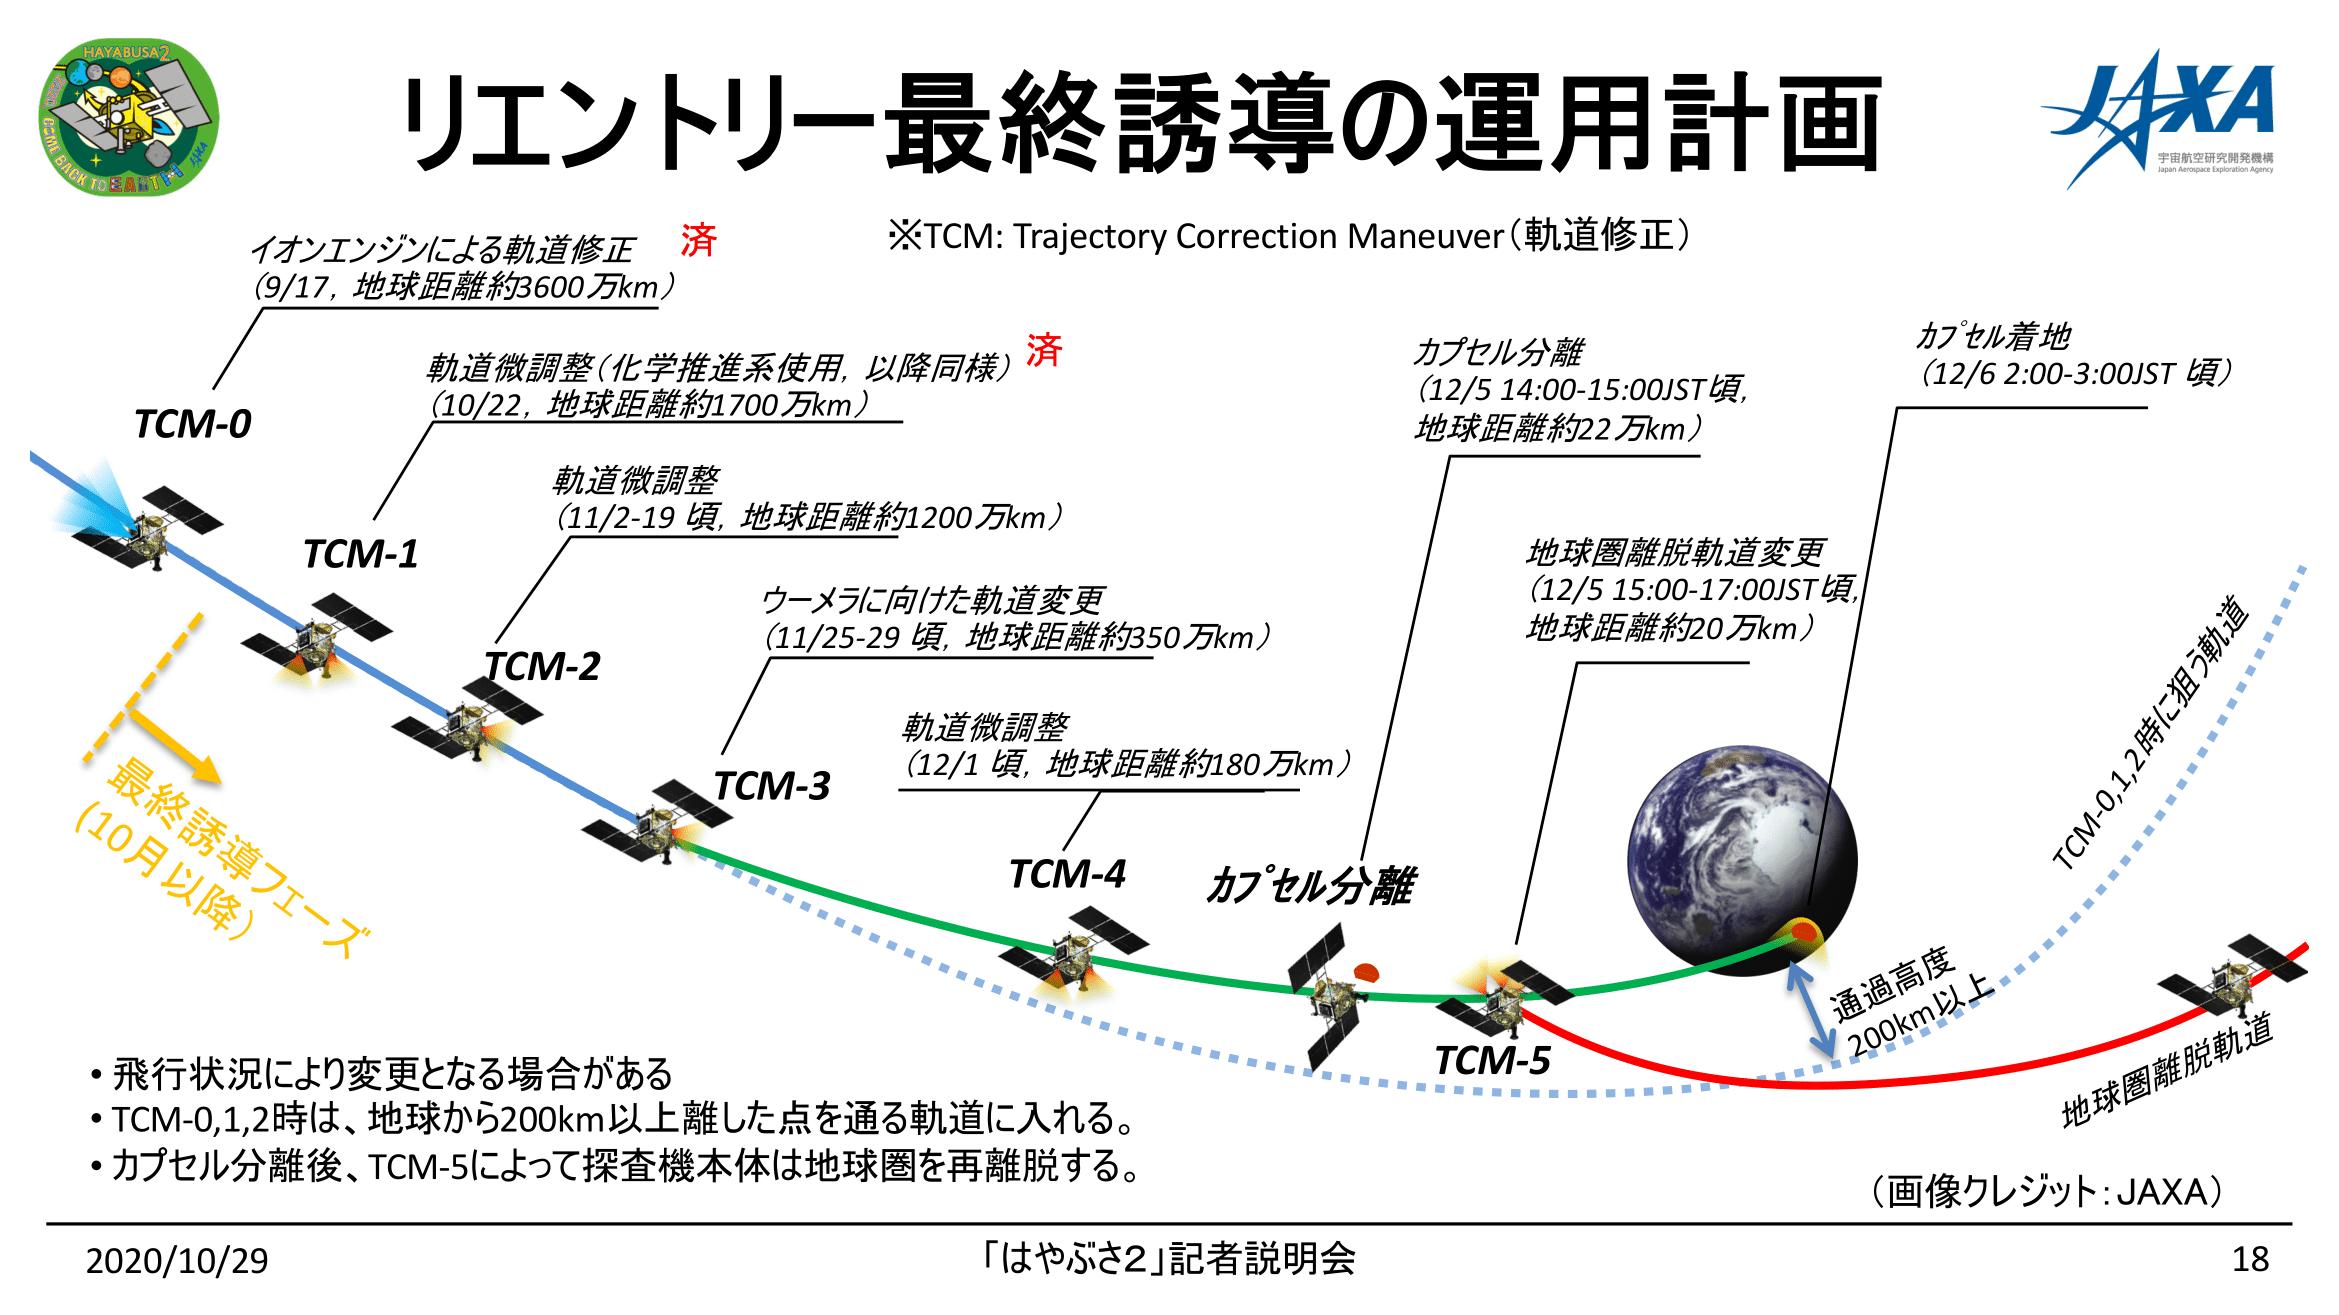 f:id:Imamura:20201029161434p:plain